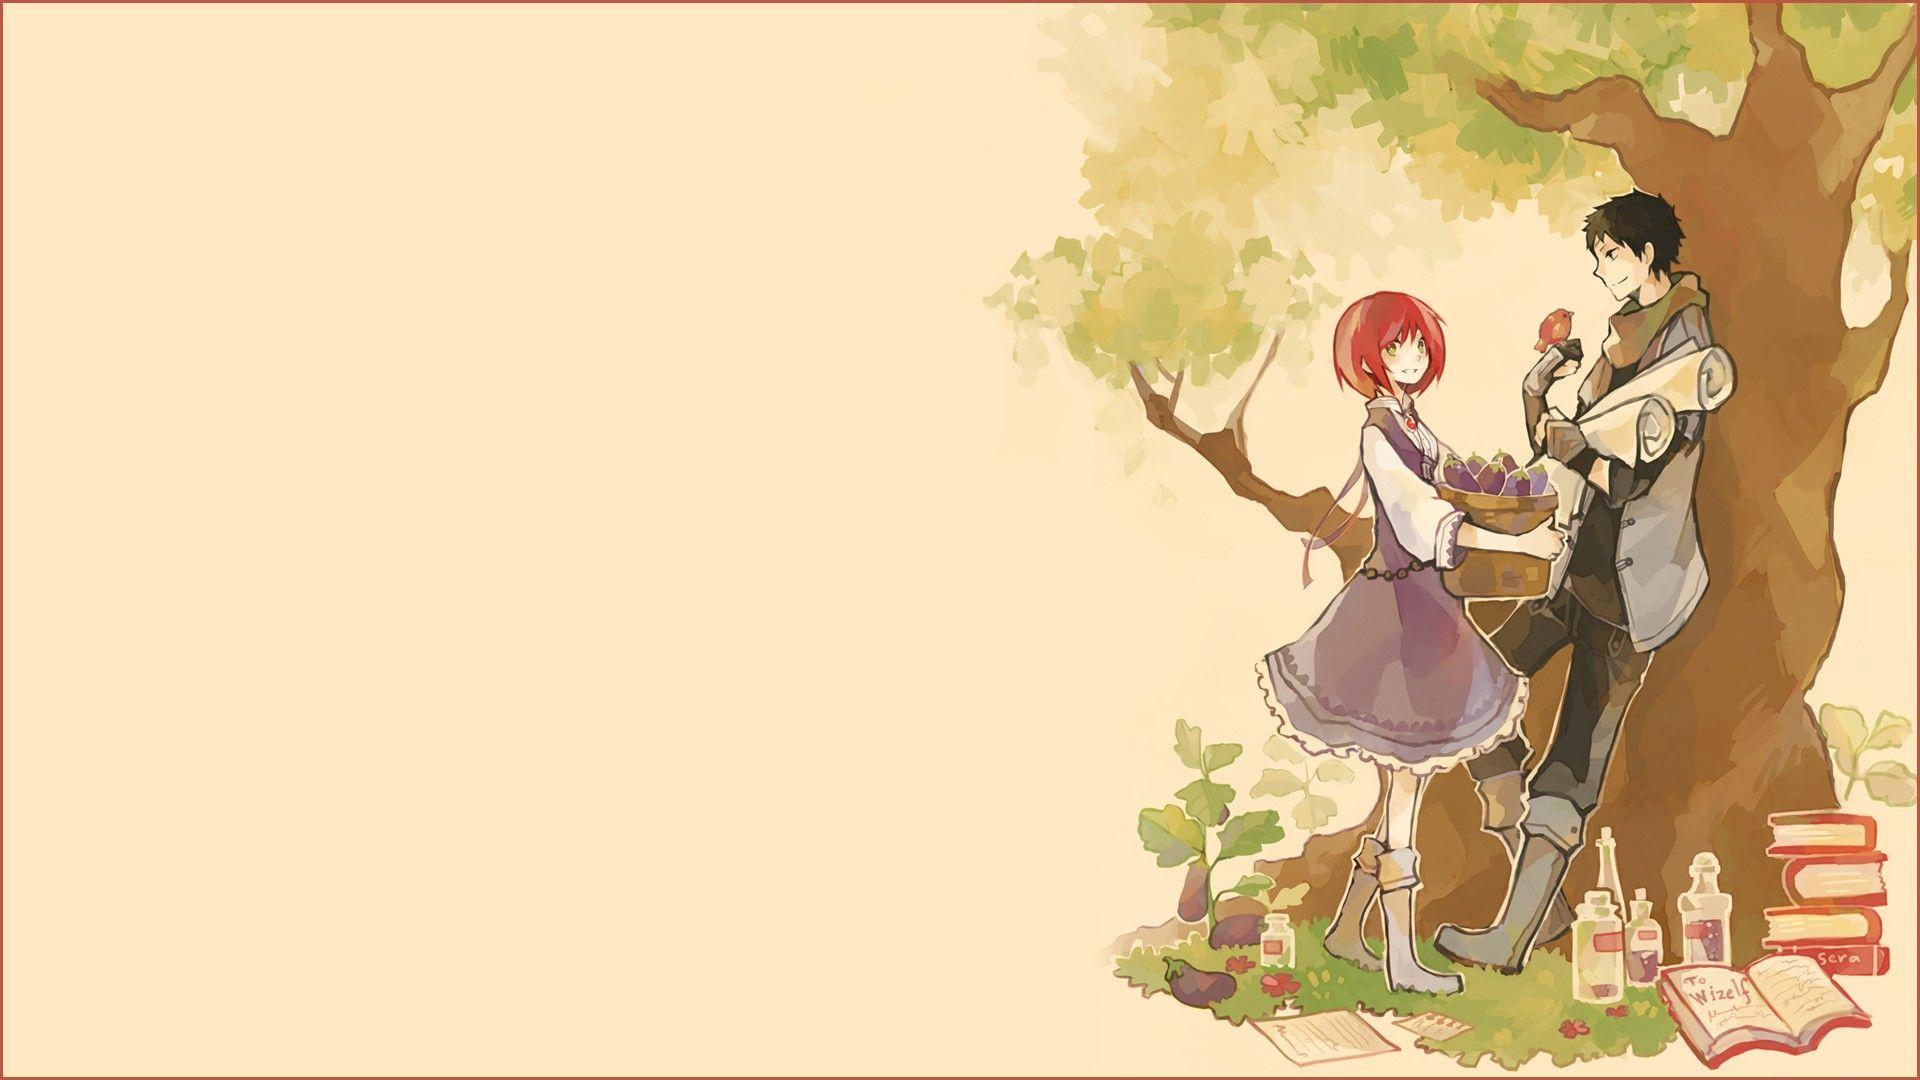 Shirayuki Obi Shirayukihime Hd Wallpaper From Gallsource Com